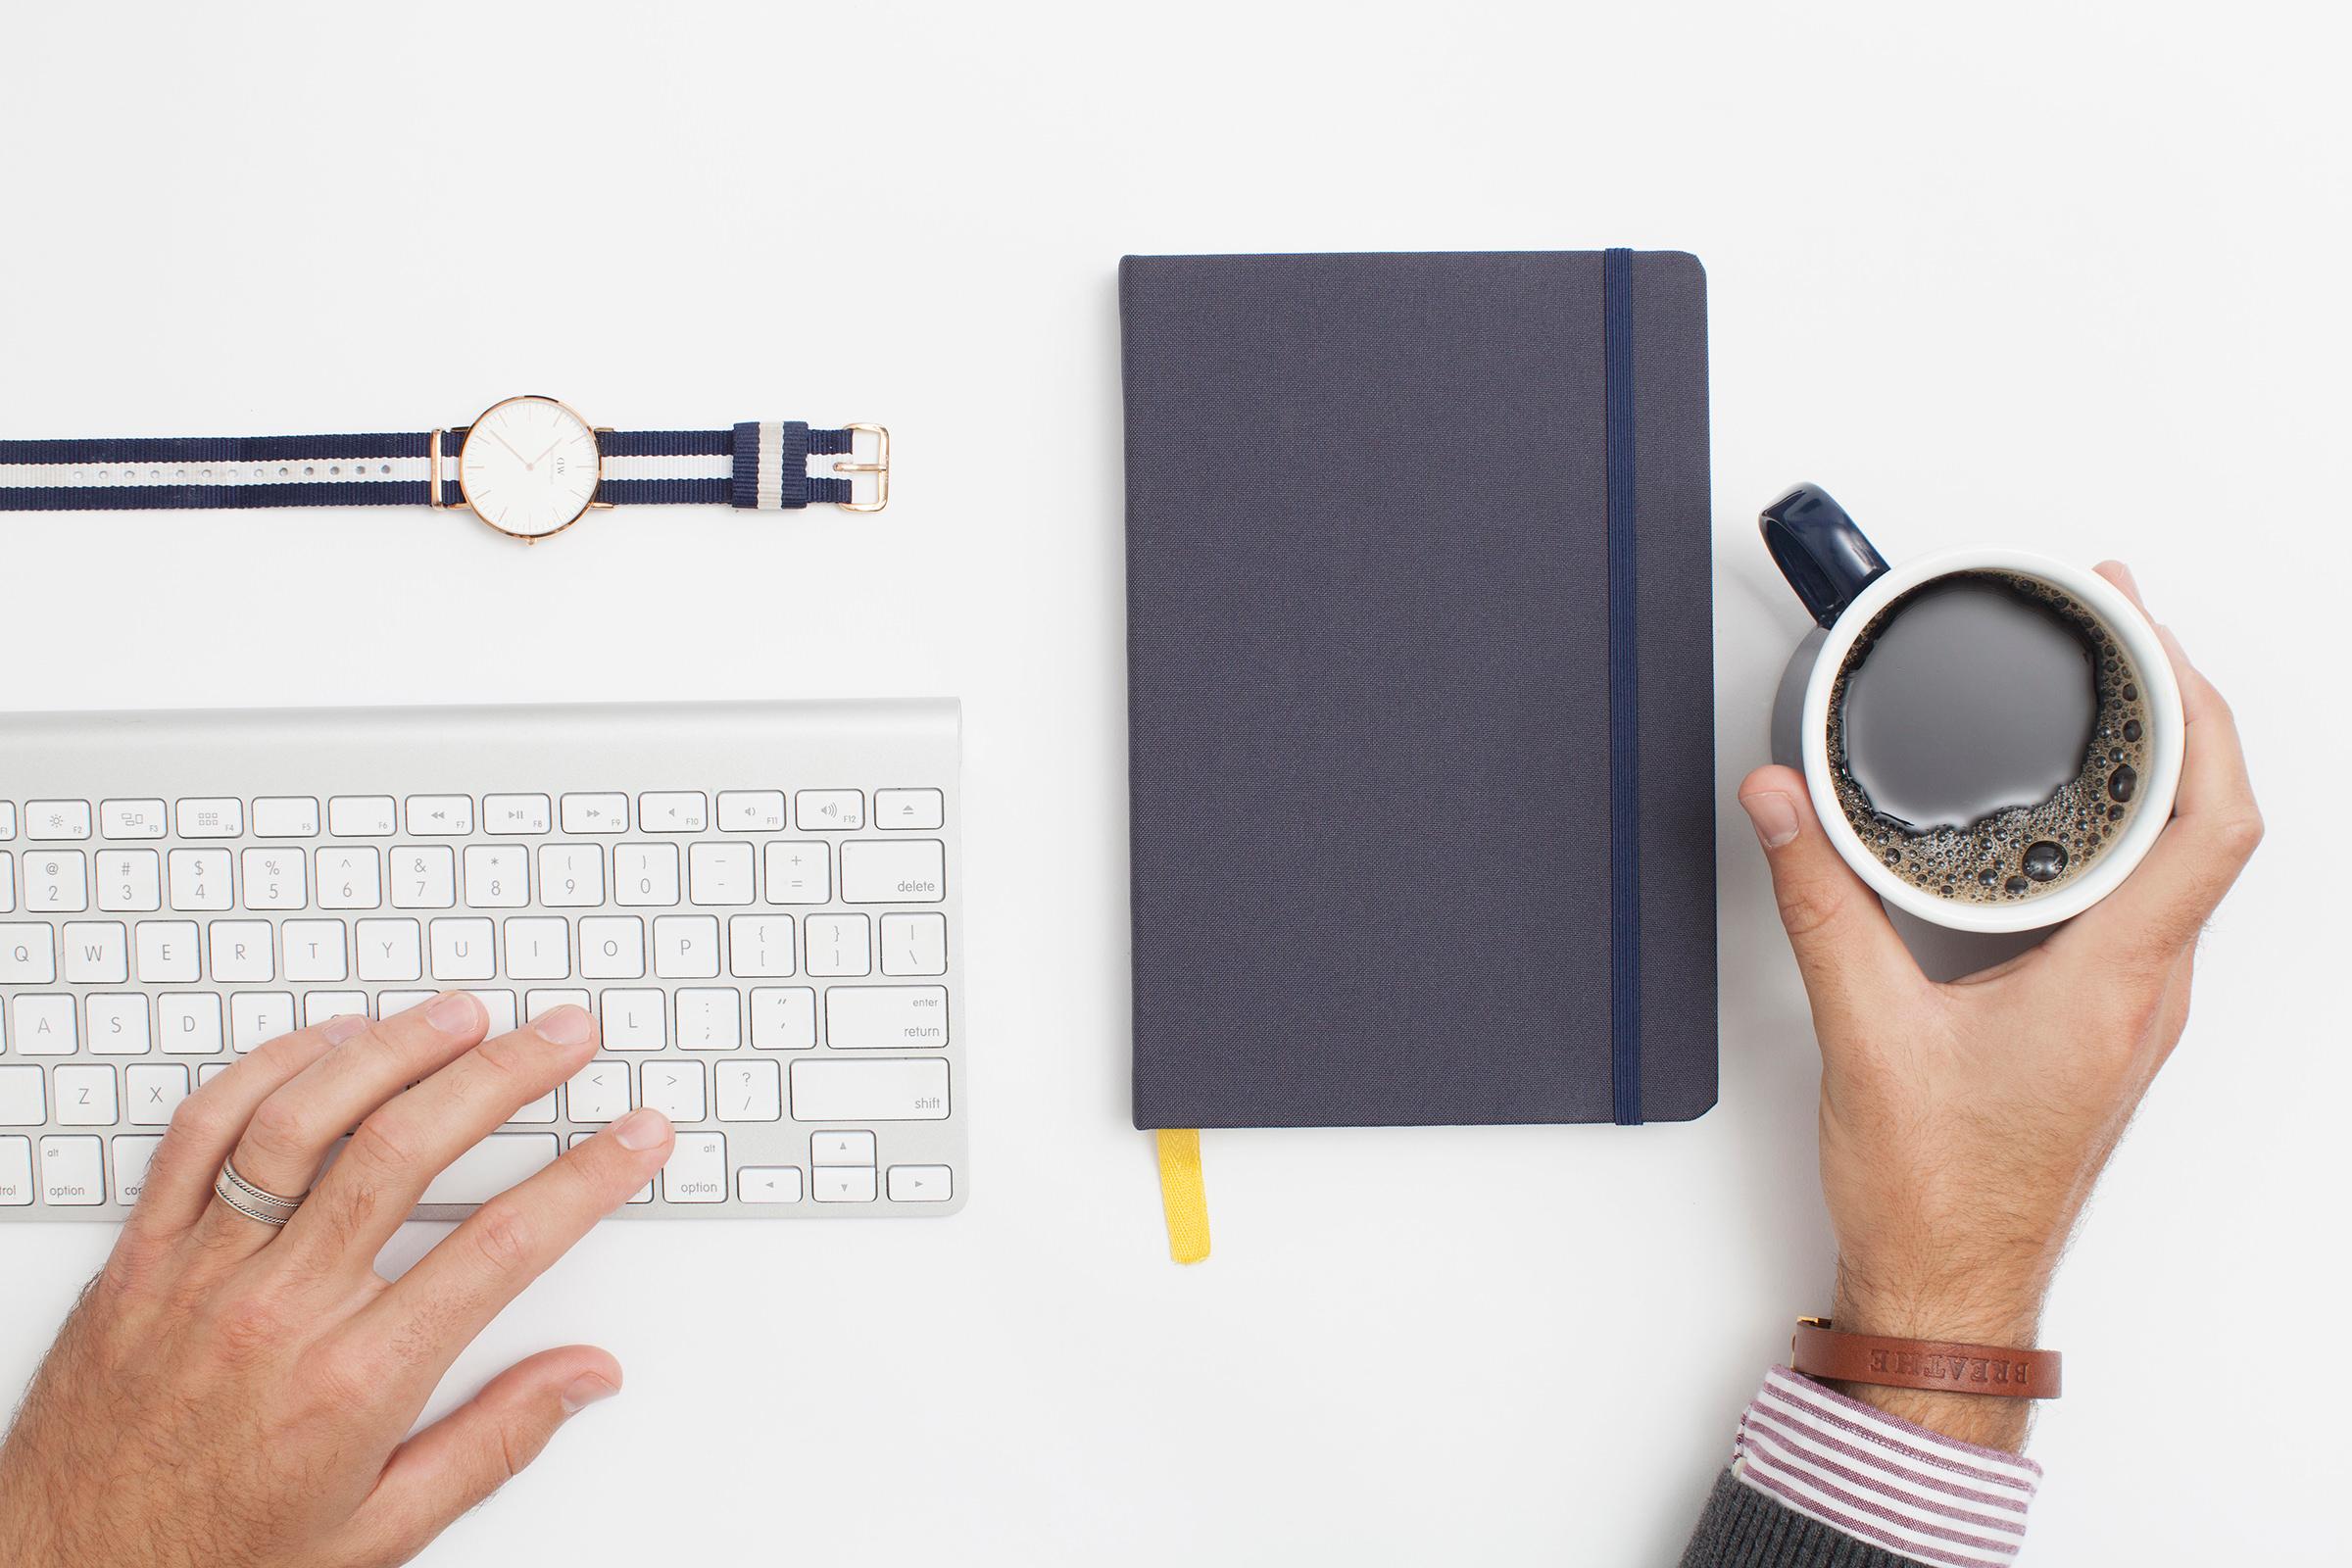 Kurs i Mediestrategi &- planlegging